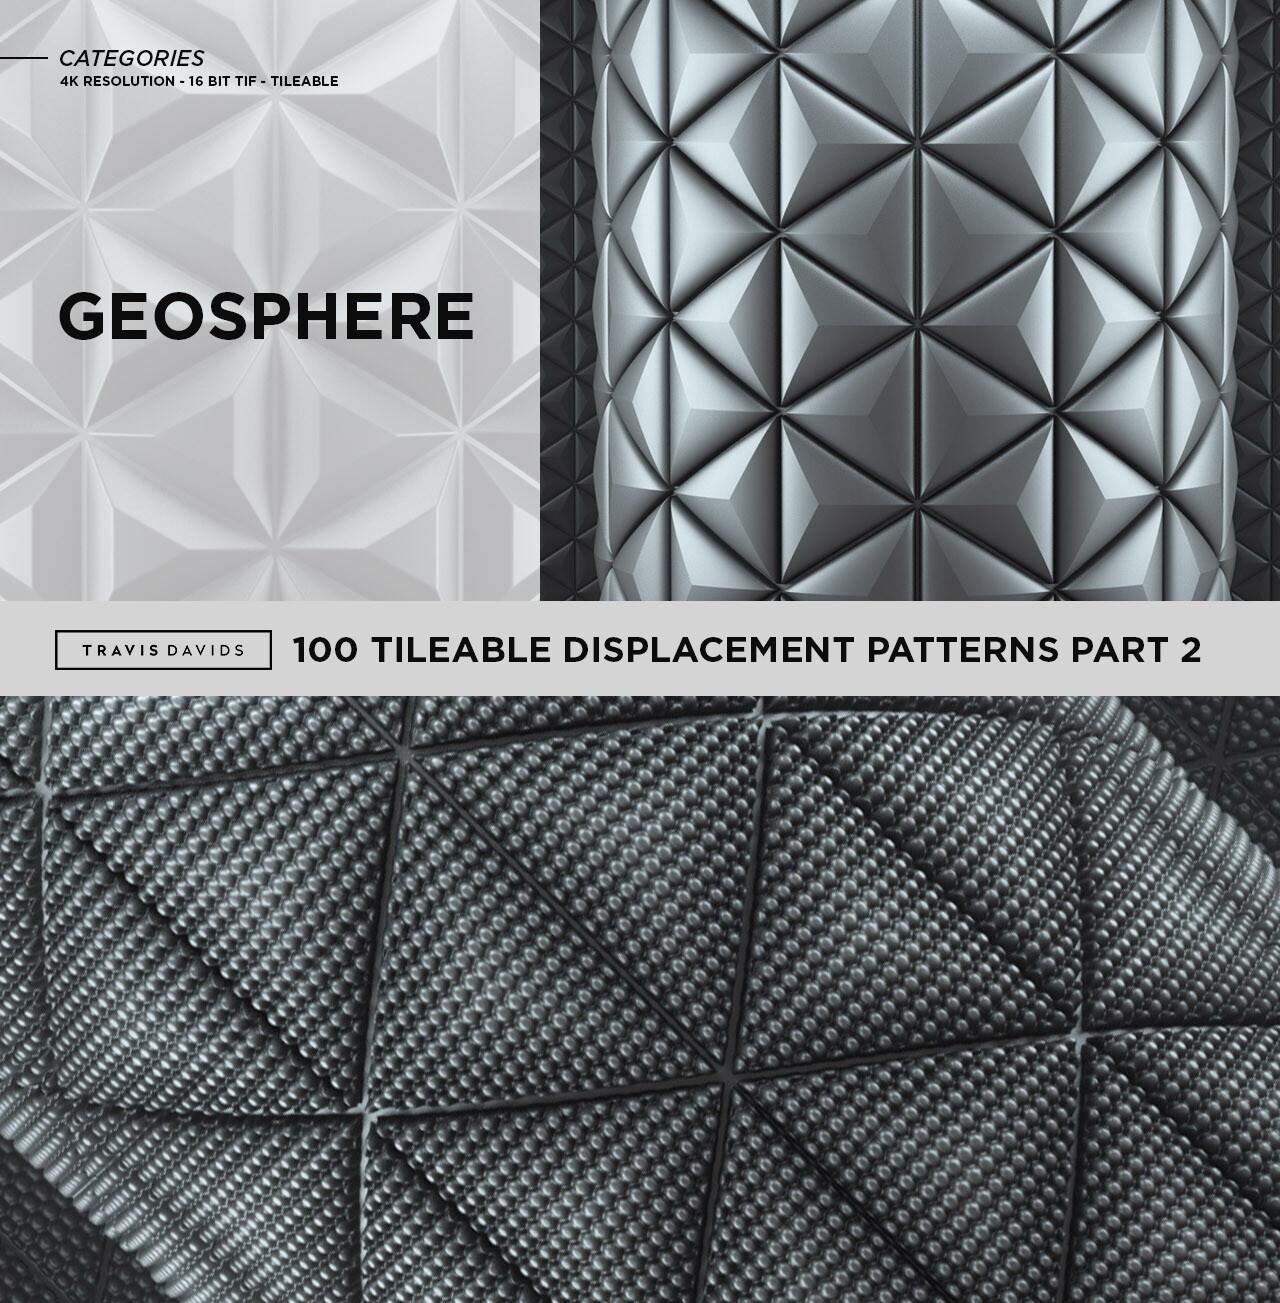 Travis davids categories geosphere